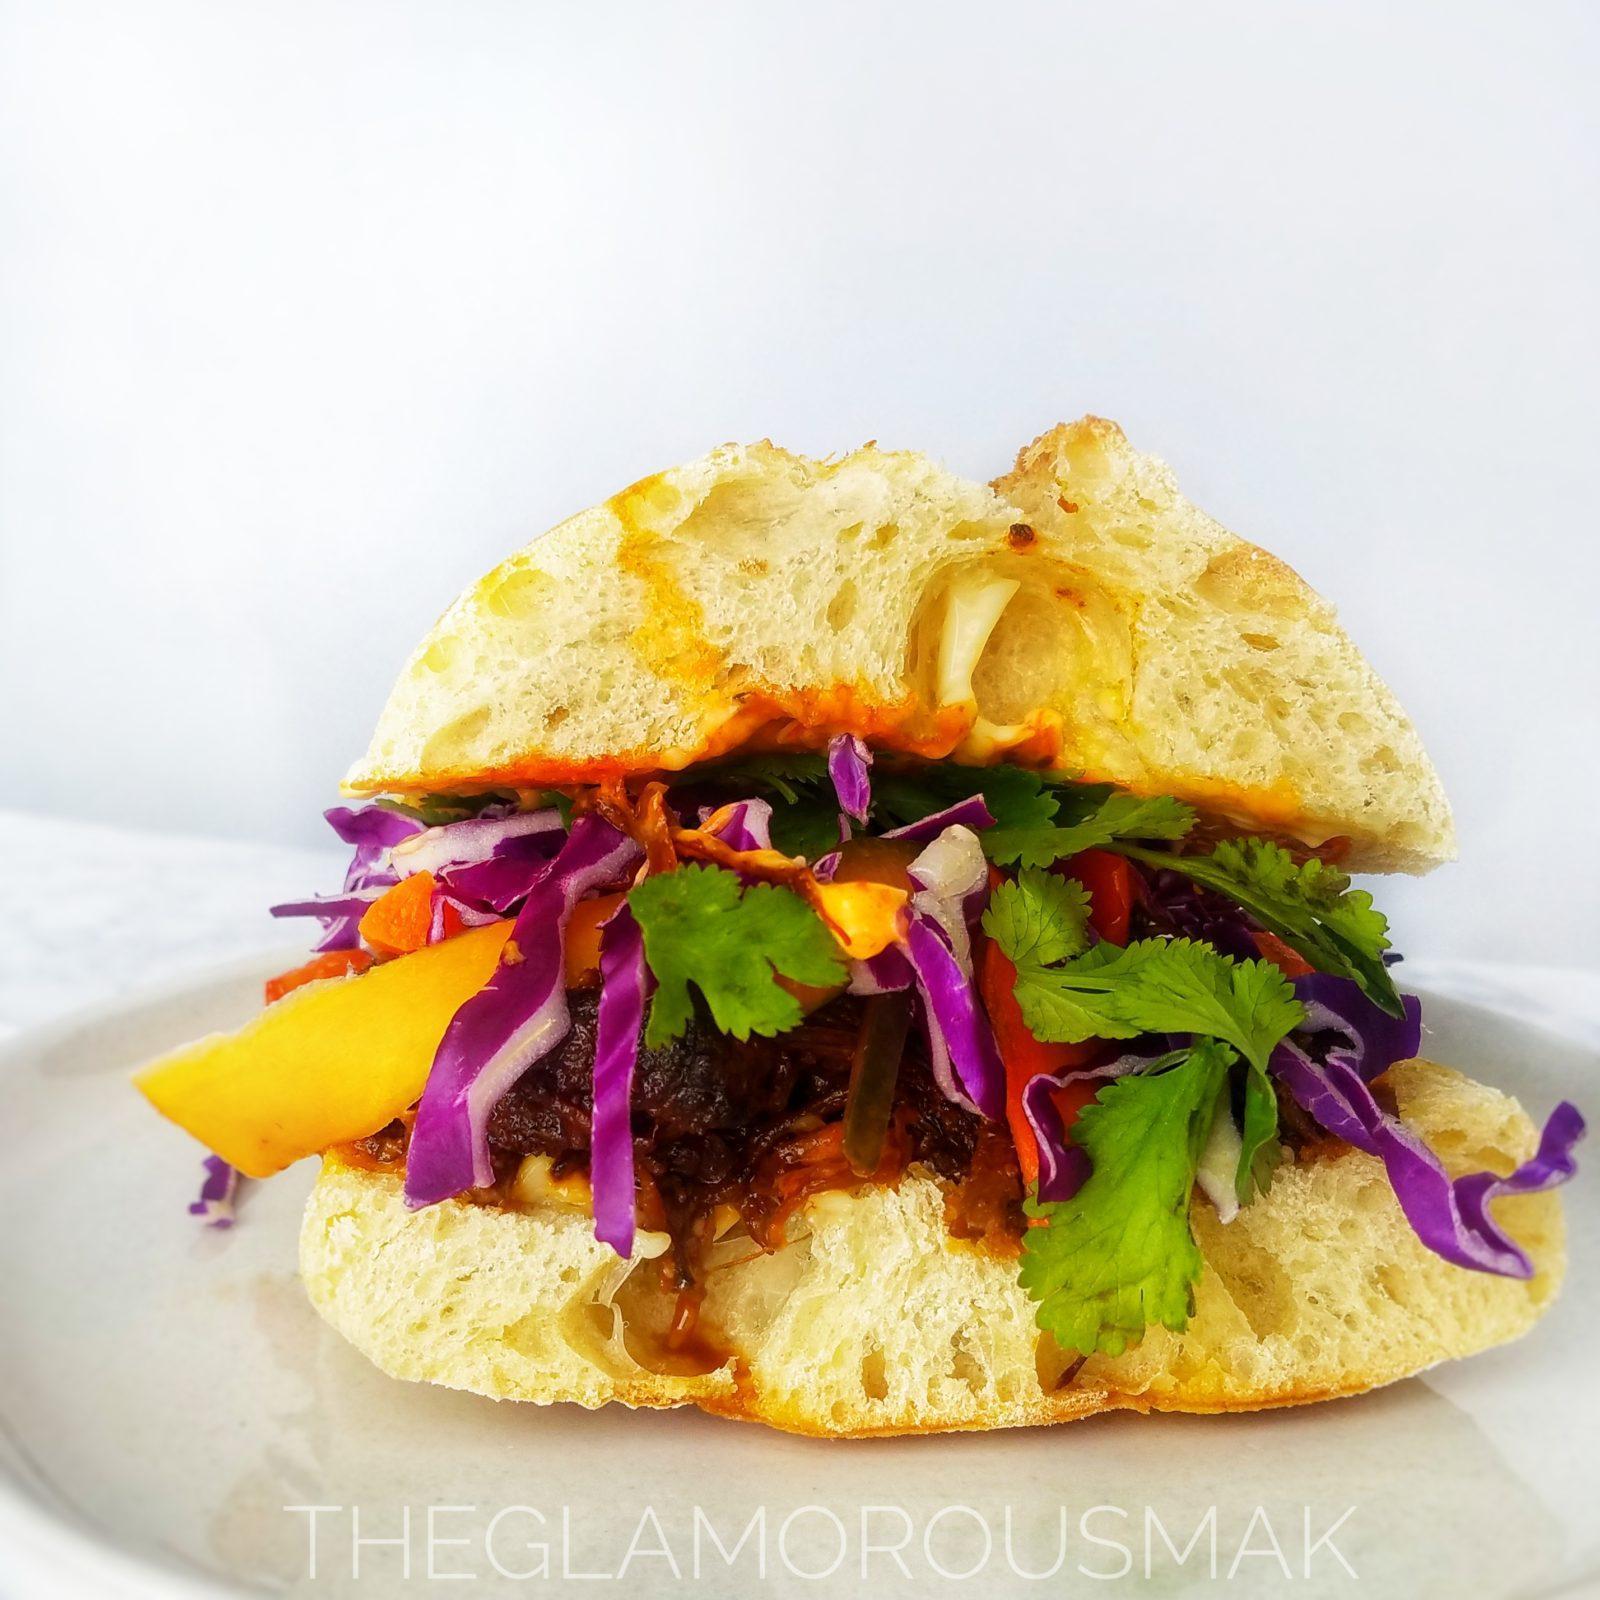 banh mi sandwich recipe vietnames street food